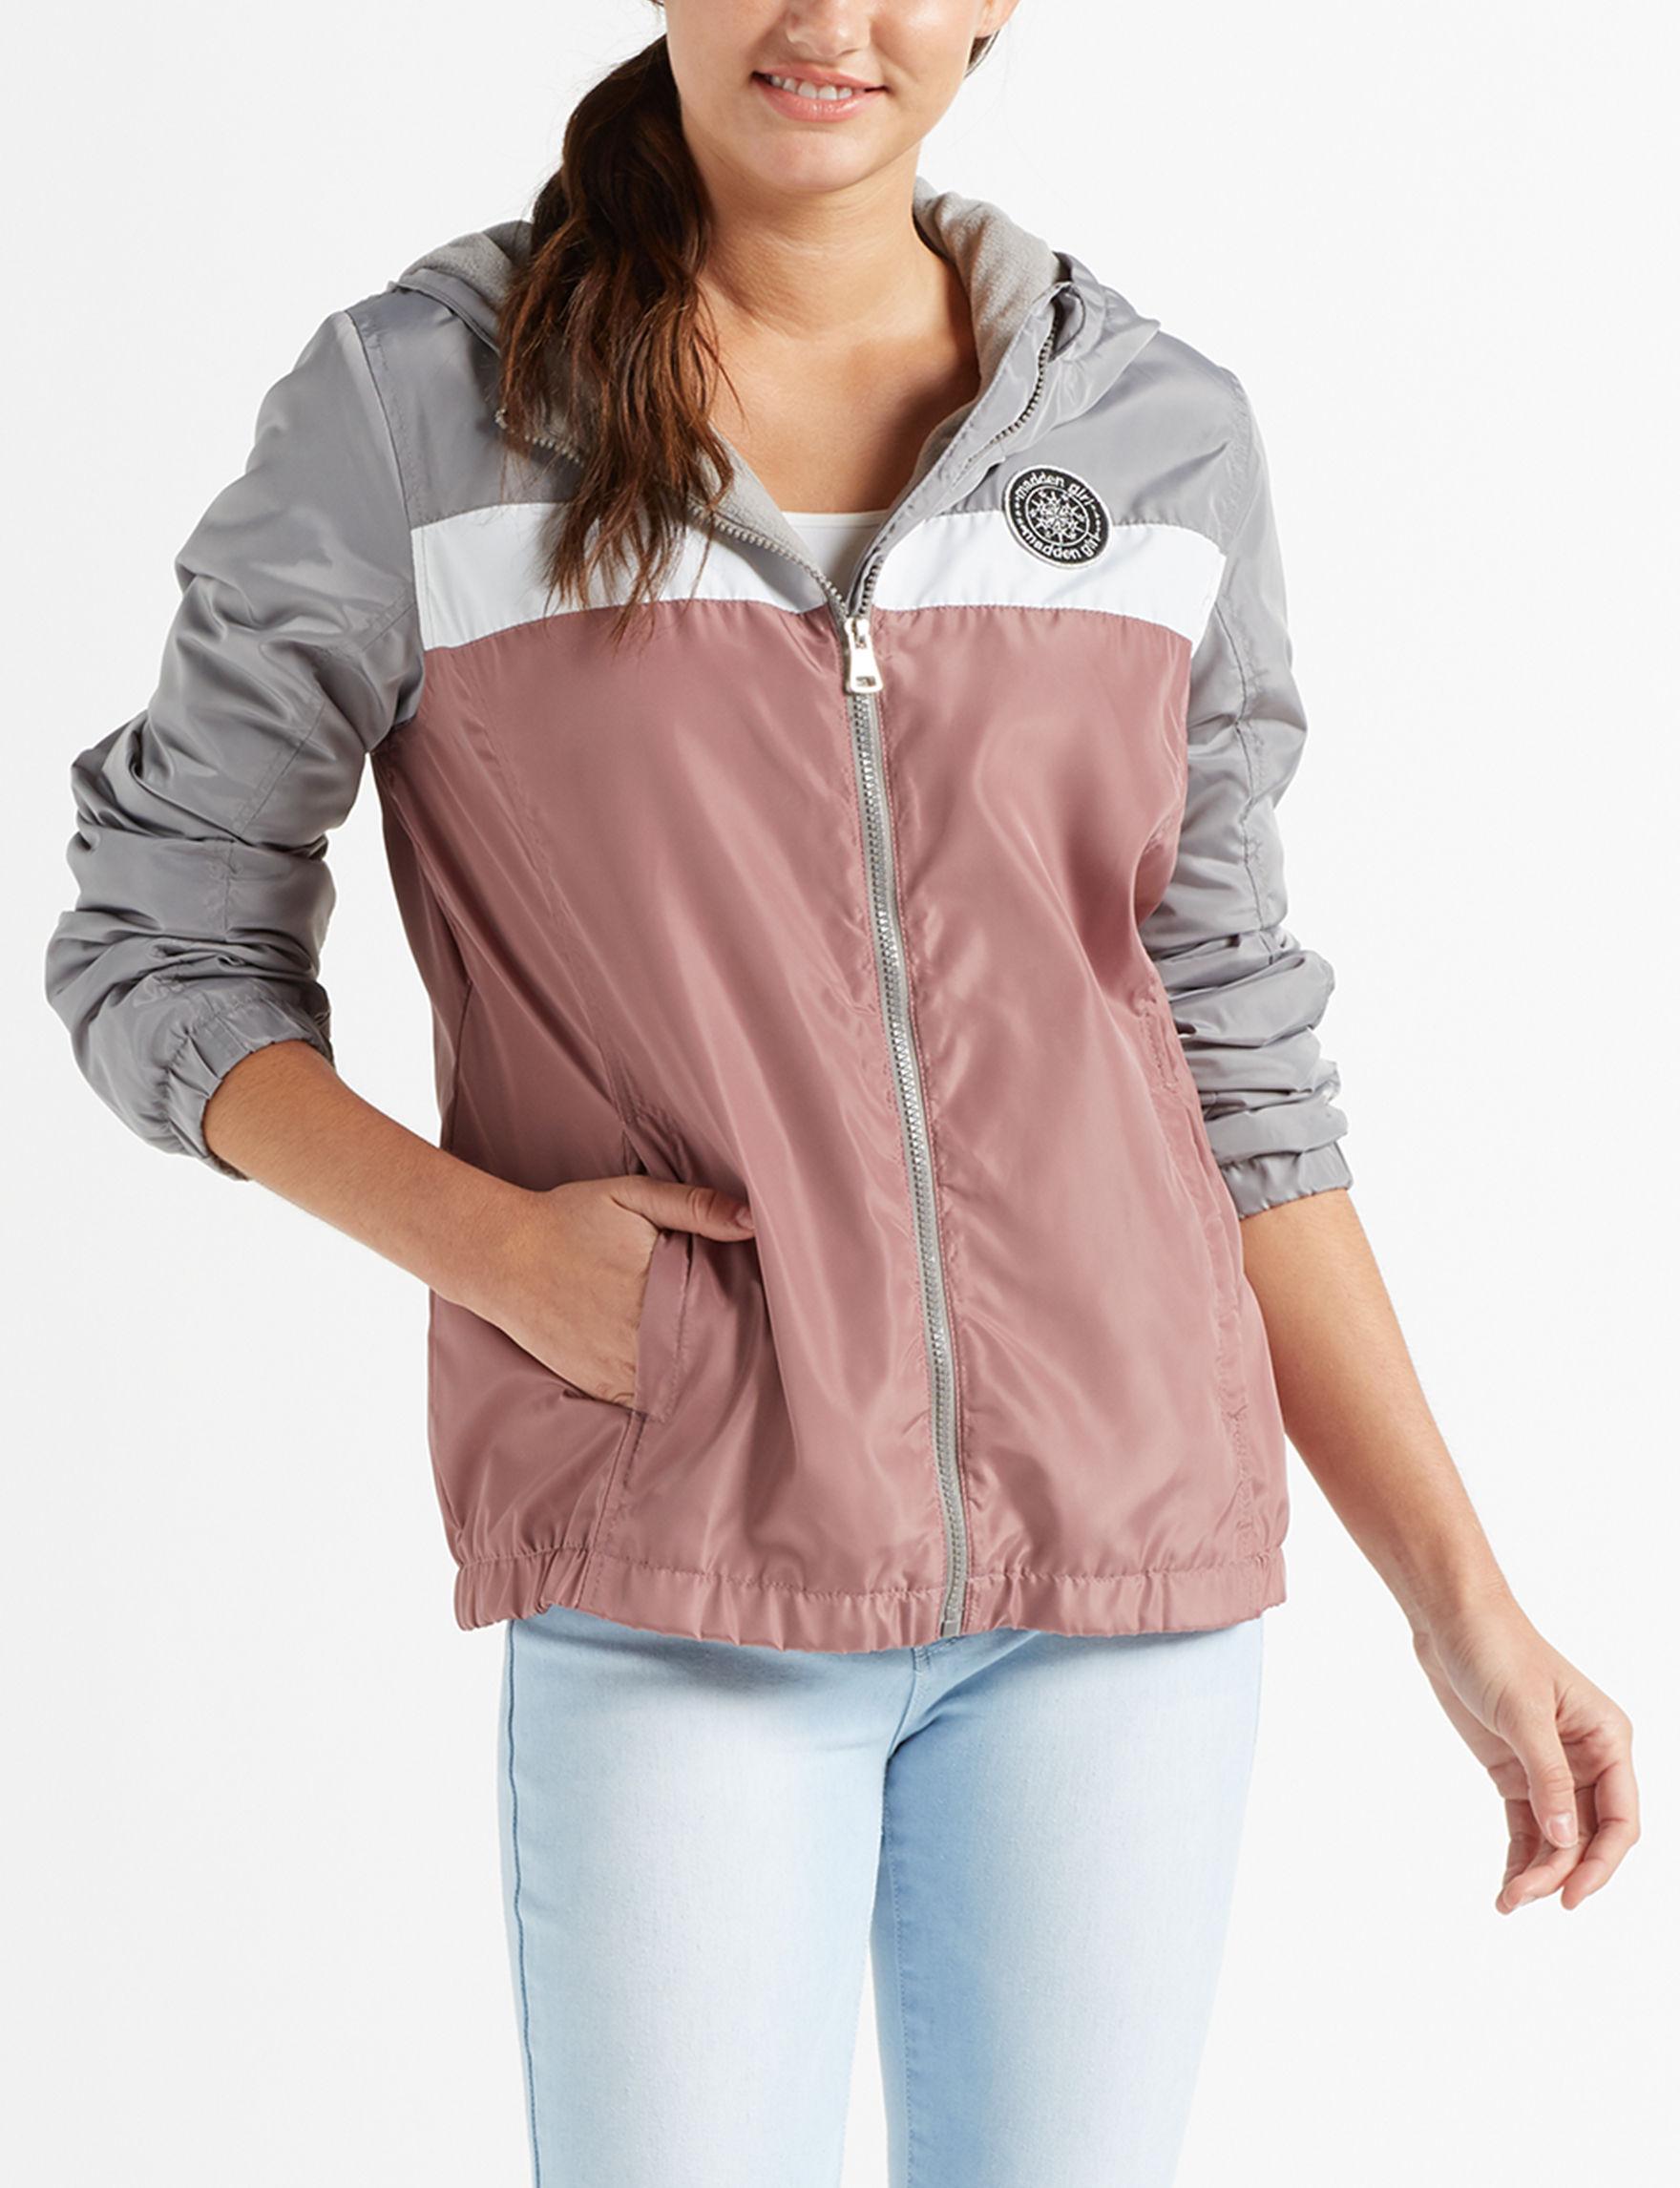 Madden Girl Pink / Multi Lightweight Jackets & Blazers